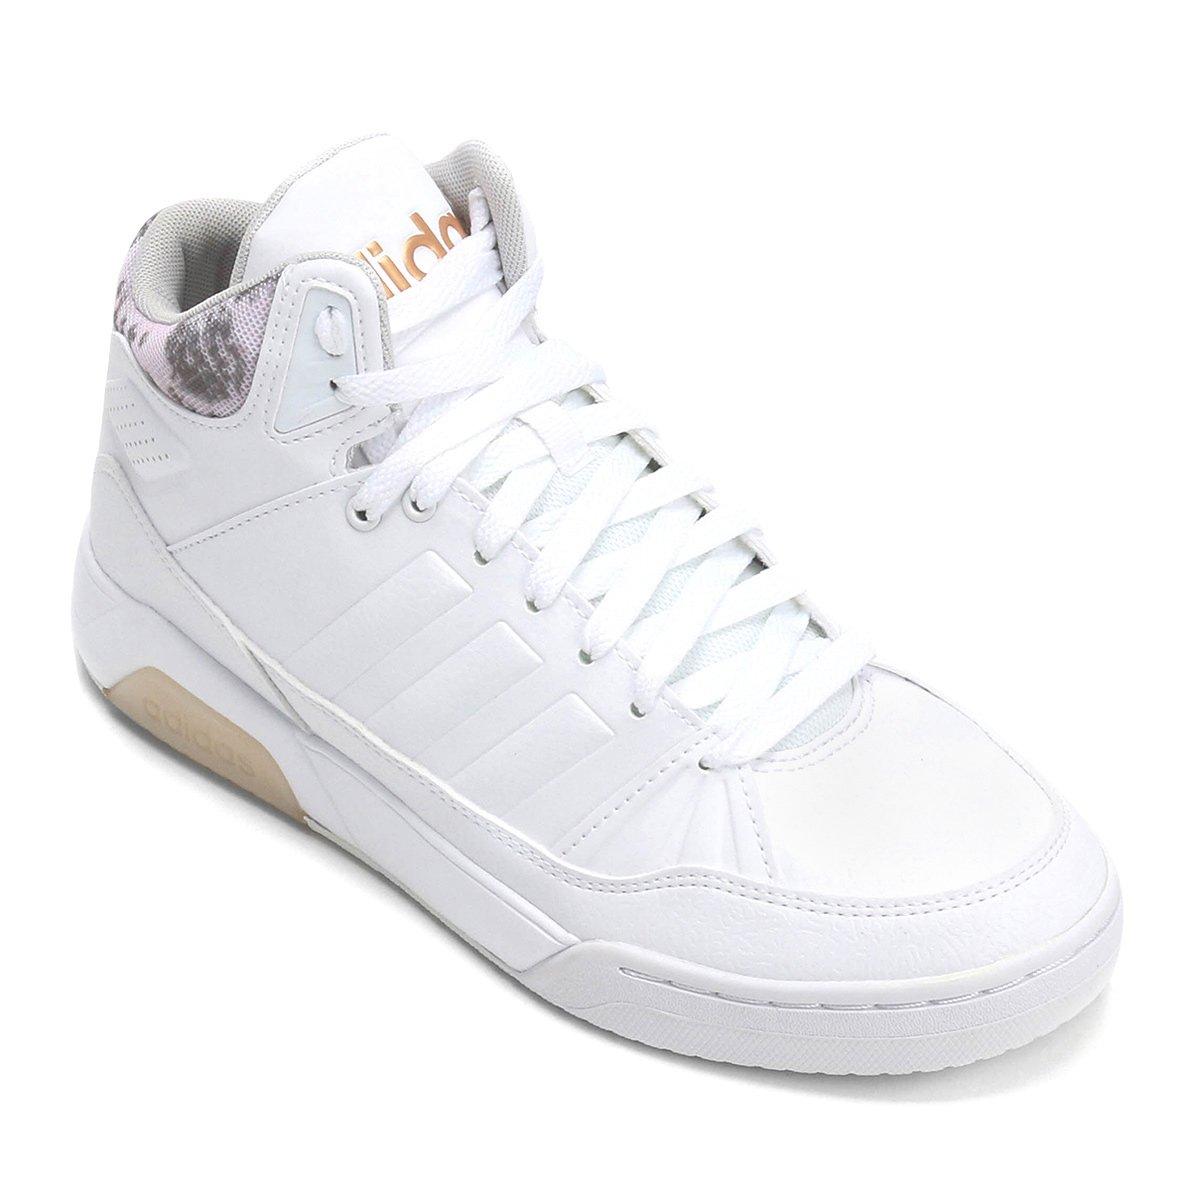 Branco Tênis Feminino Tênis Adidas Adidas Play9Tis 5xXnIq